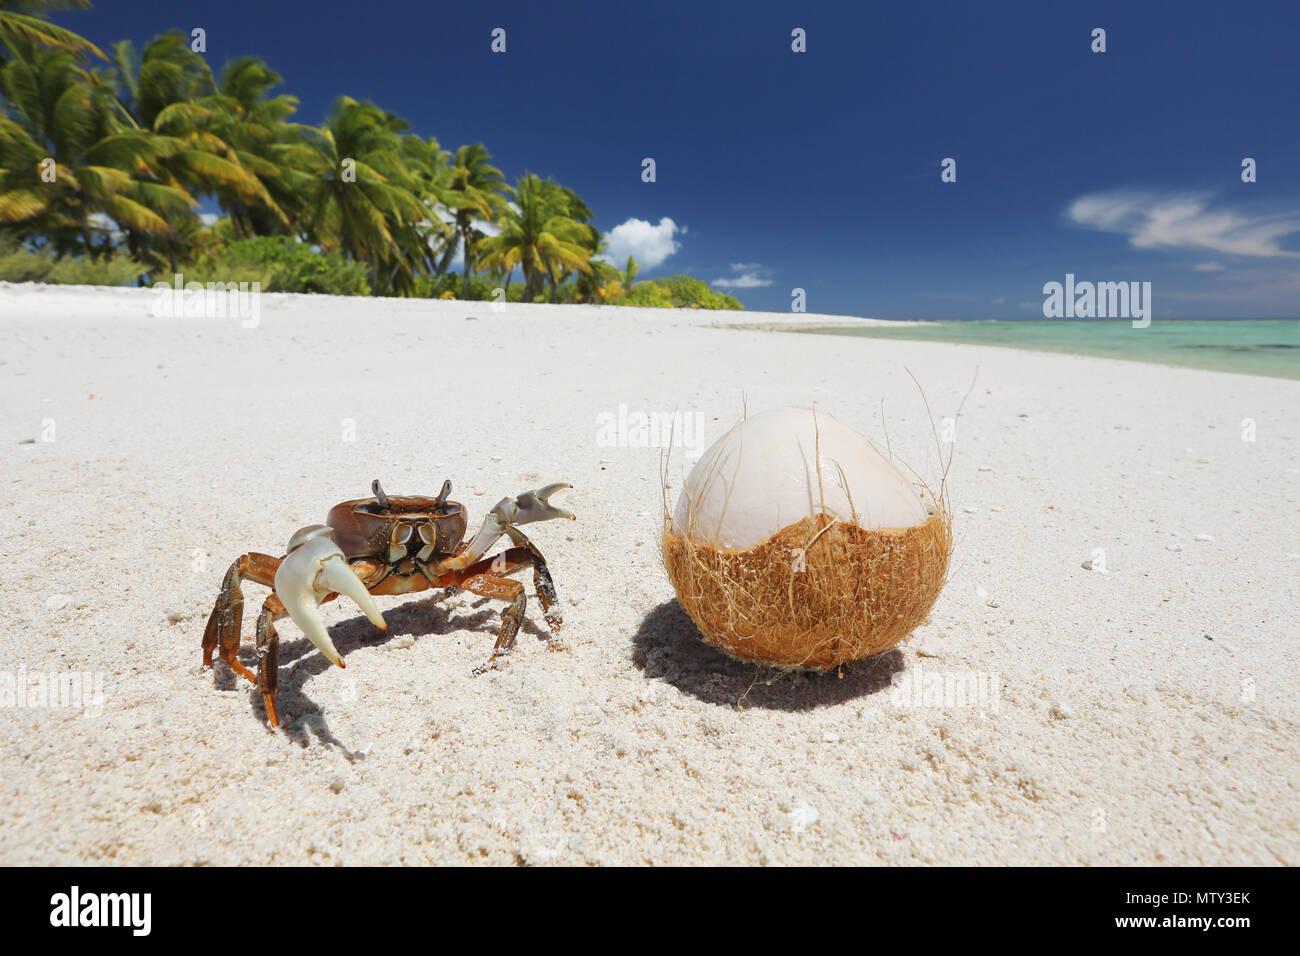 Crab and coconut on pristine white sandy beach, Christmas Island ...